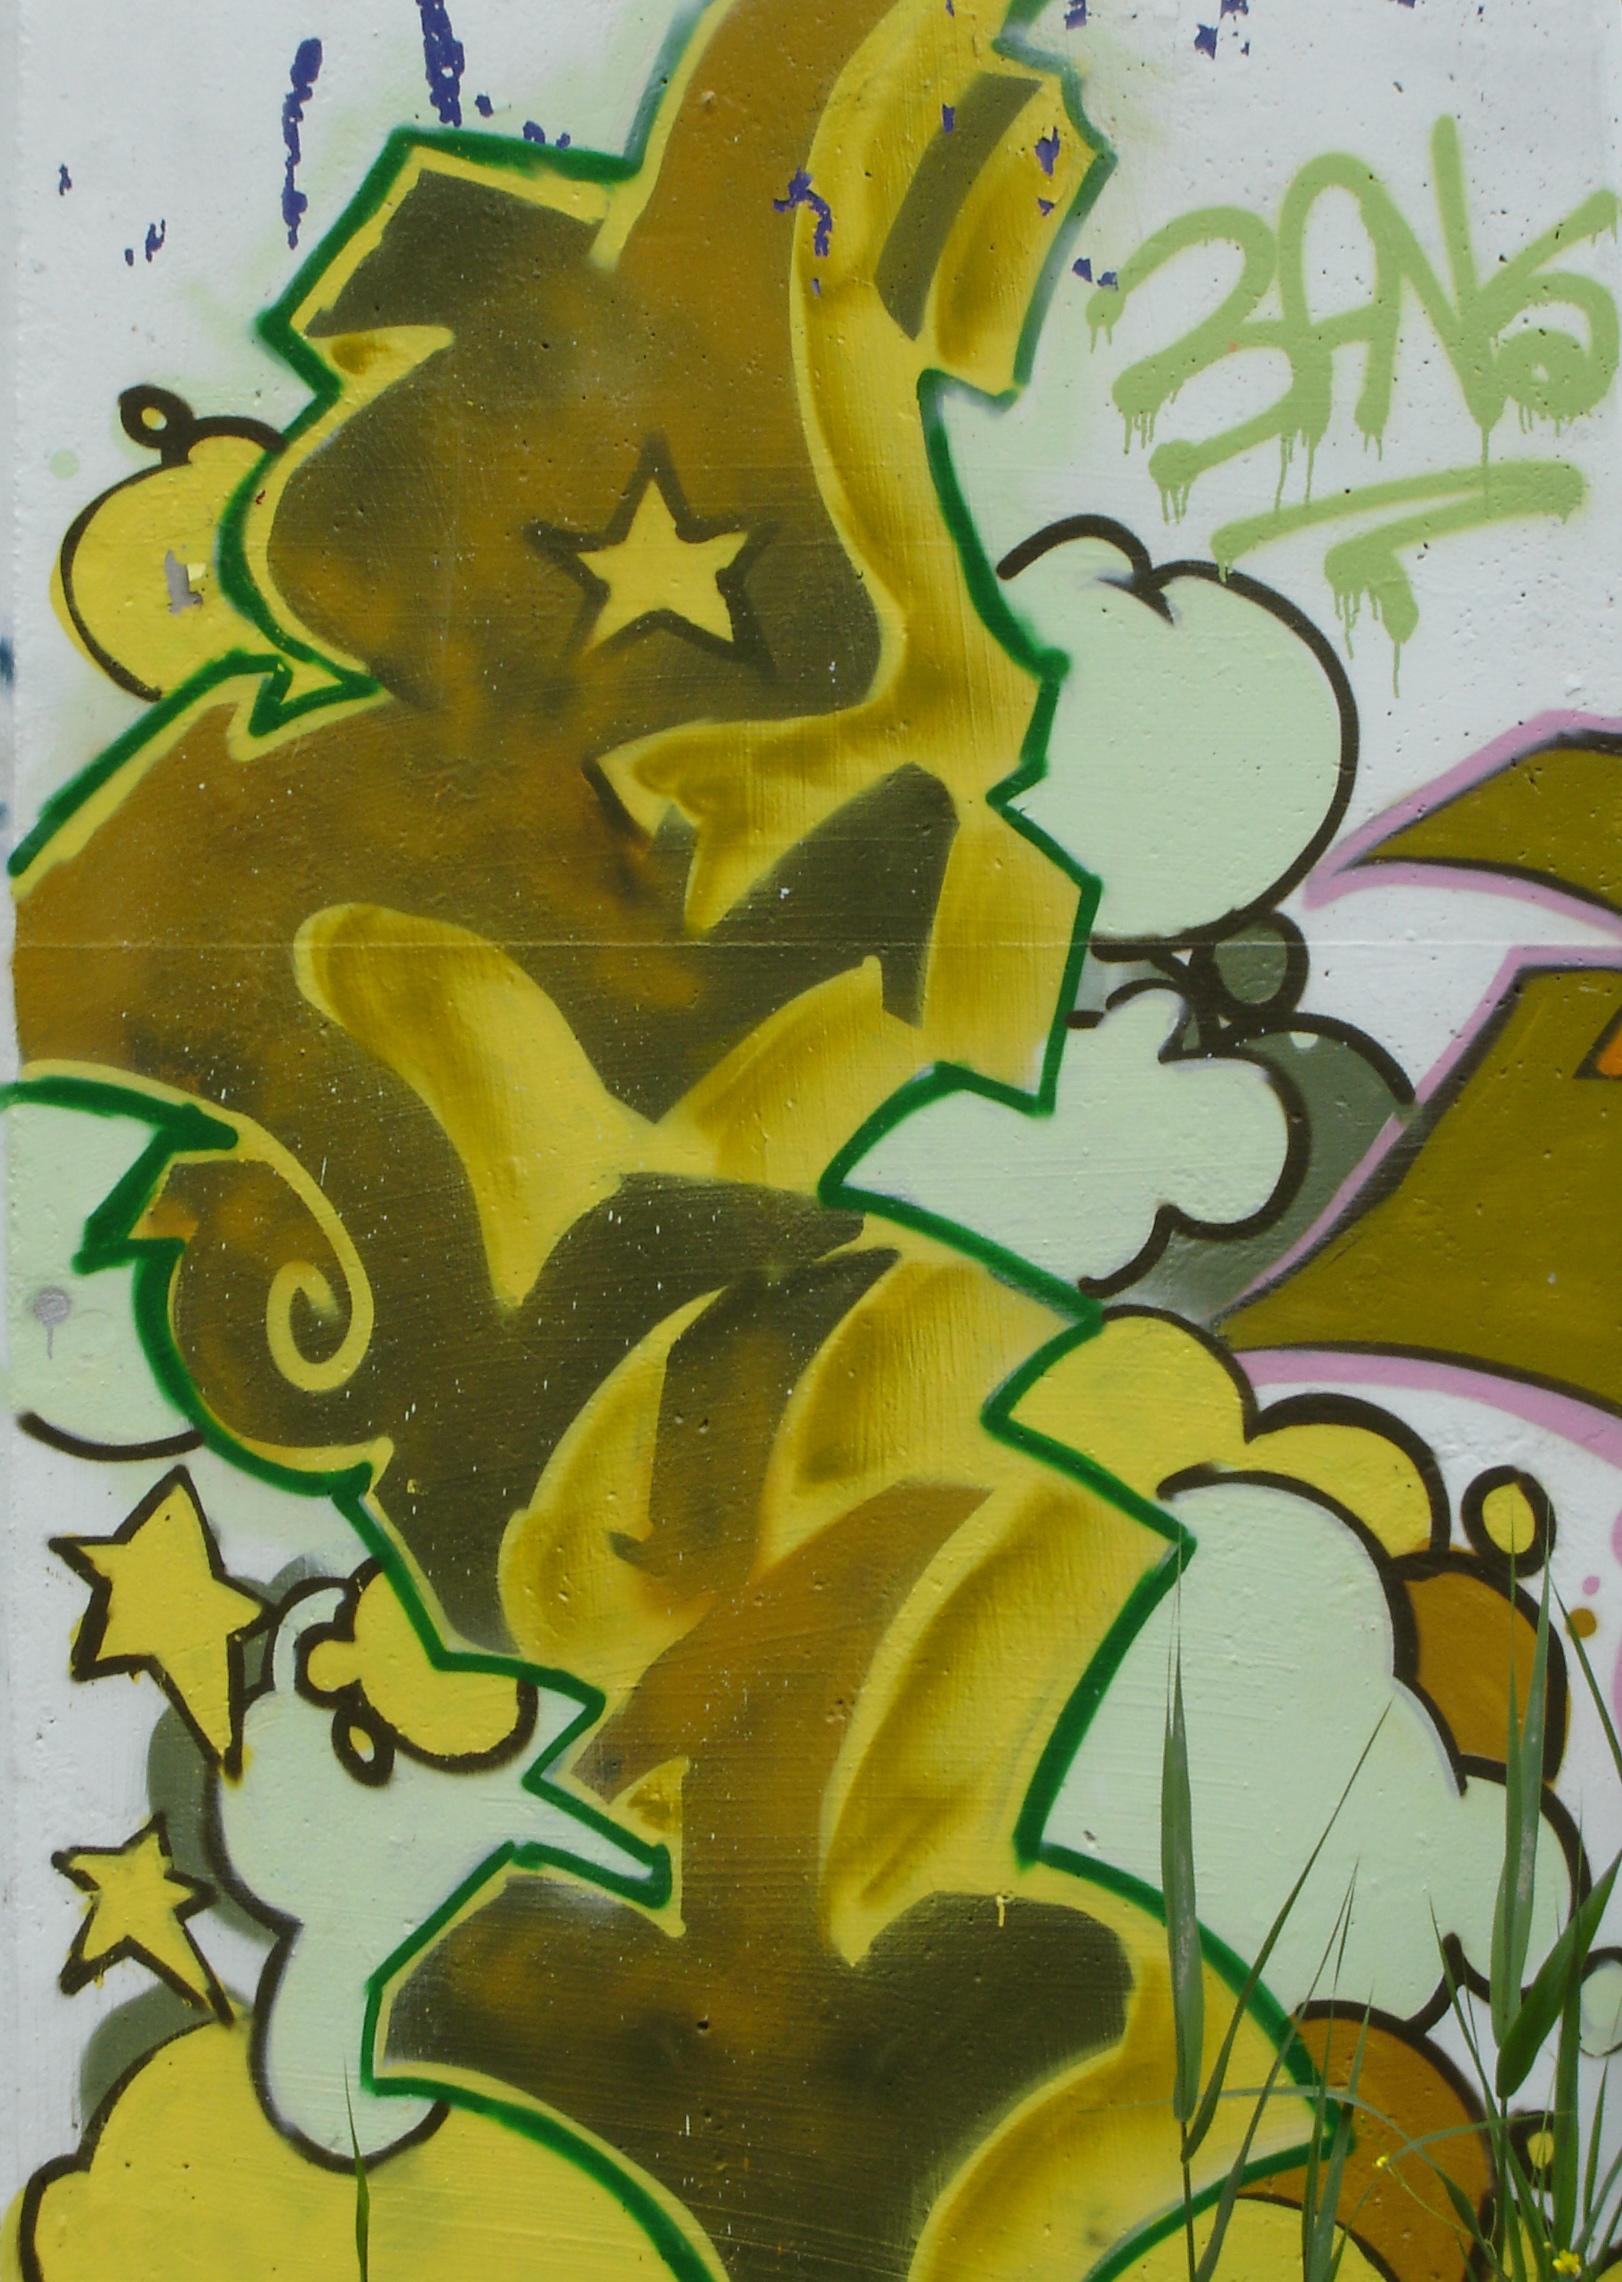 Graffiti on the Glen Cedar Road bridge trestle - close up